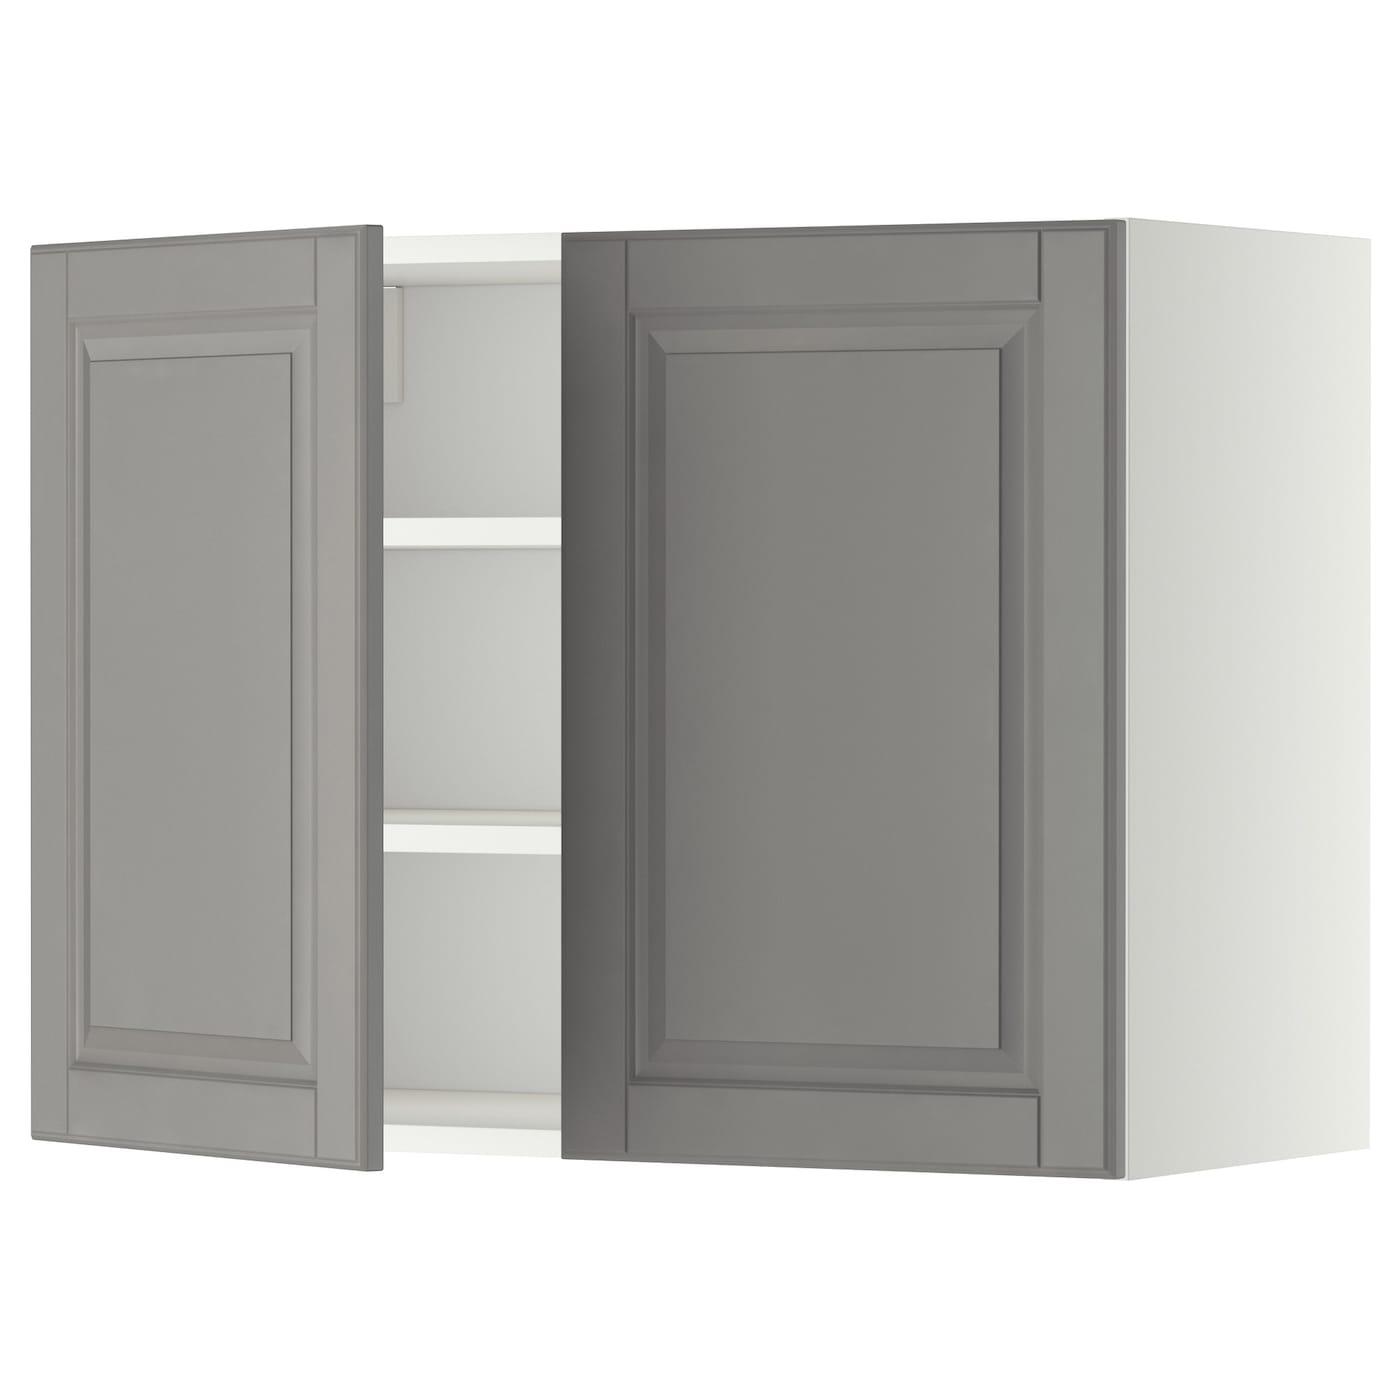 Metod armario de pared cocina con baldas blanco bodbyn gris 80 x 60 cm ikea - Armarios de cocina ikea ...